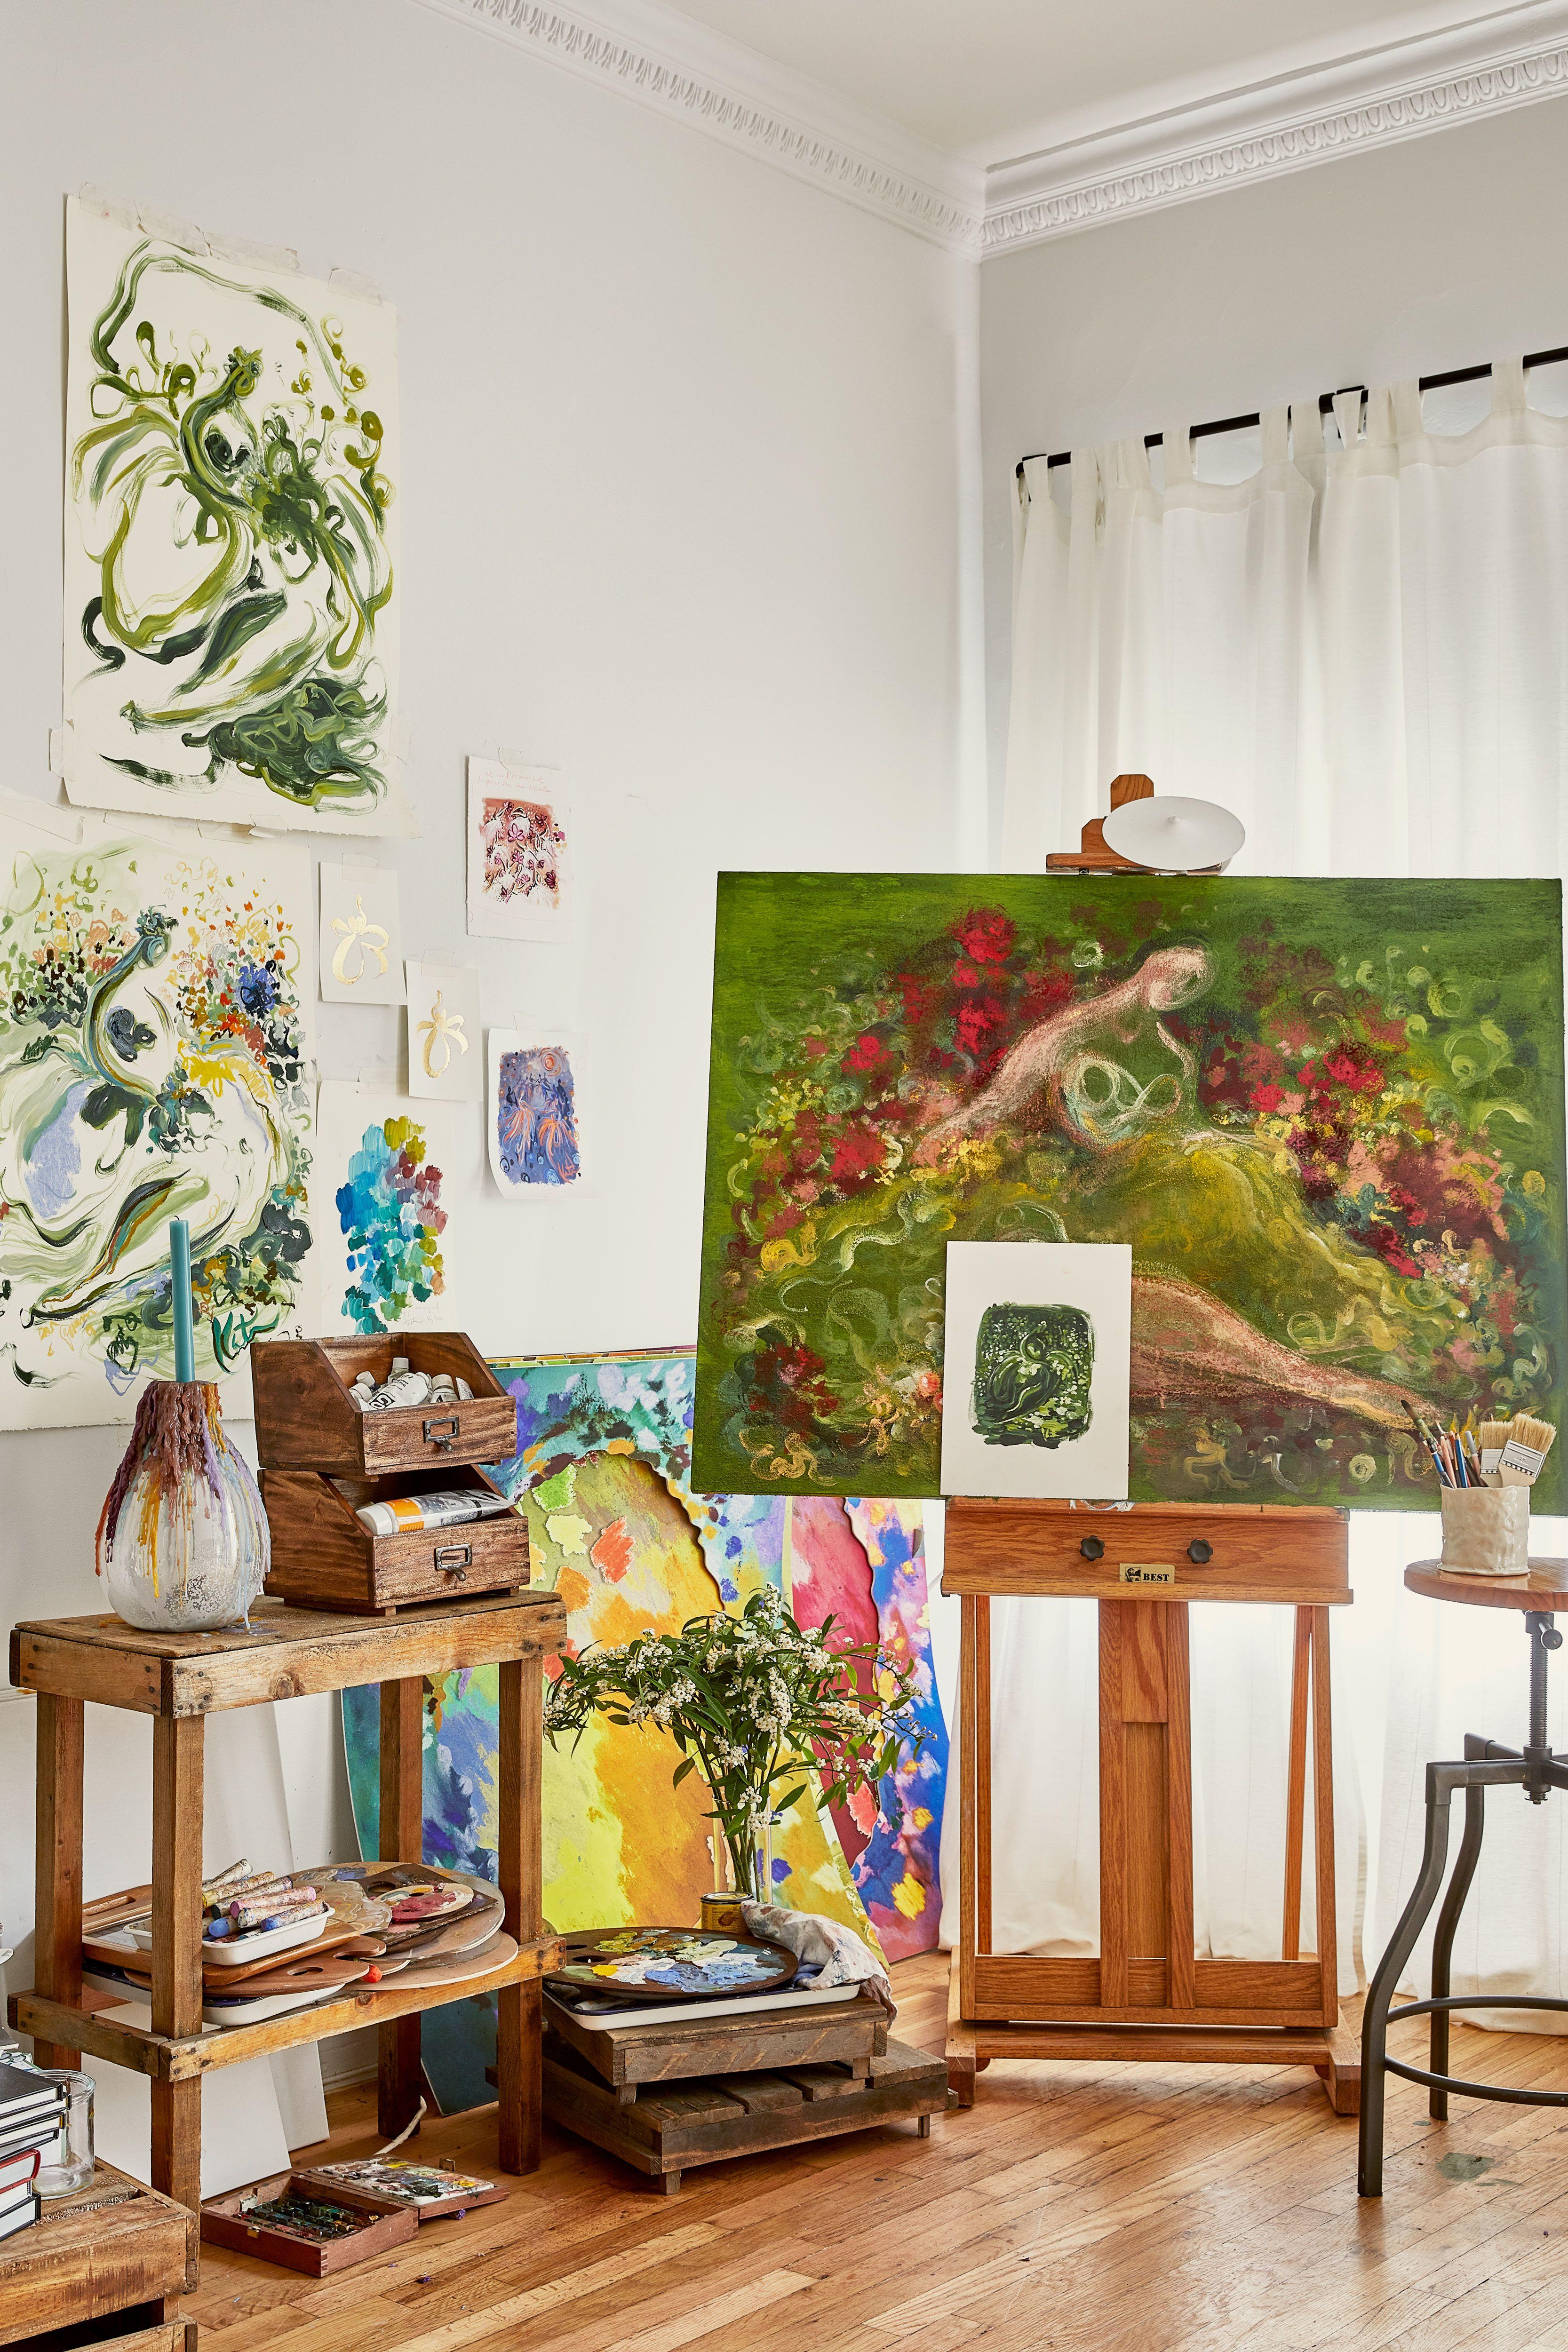 Katie Rodgers Artist Studio Tour NYC, Office Design Tips